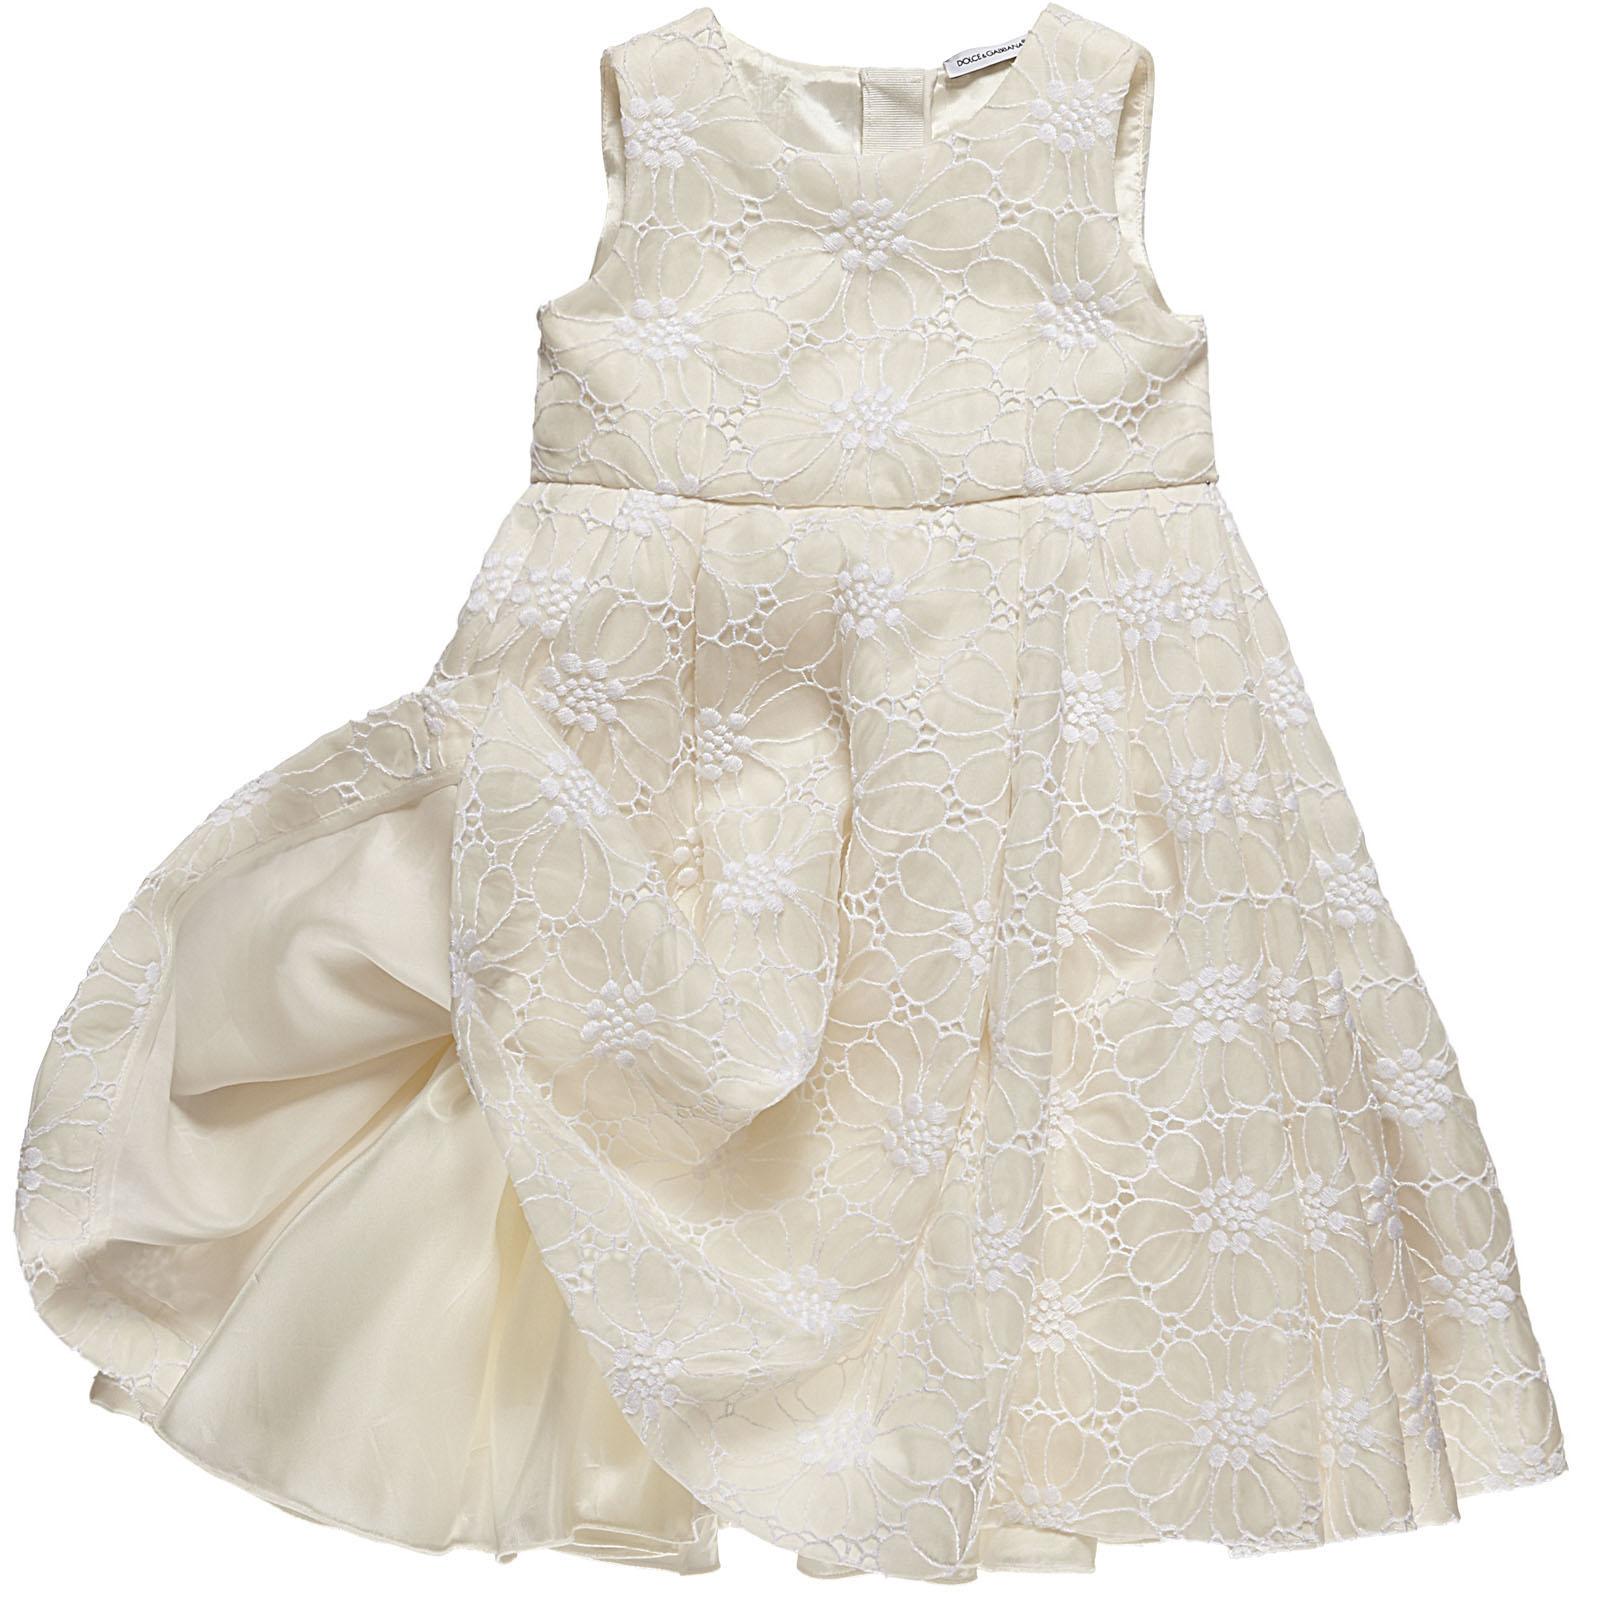 Dolce and Gabbana Spring Summer 2014 white silk dress